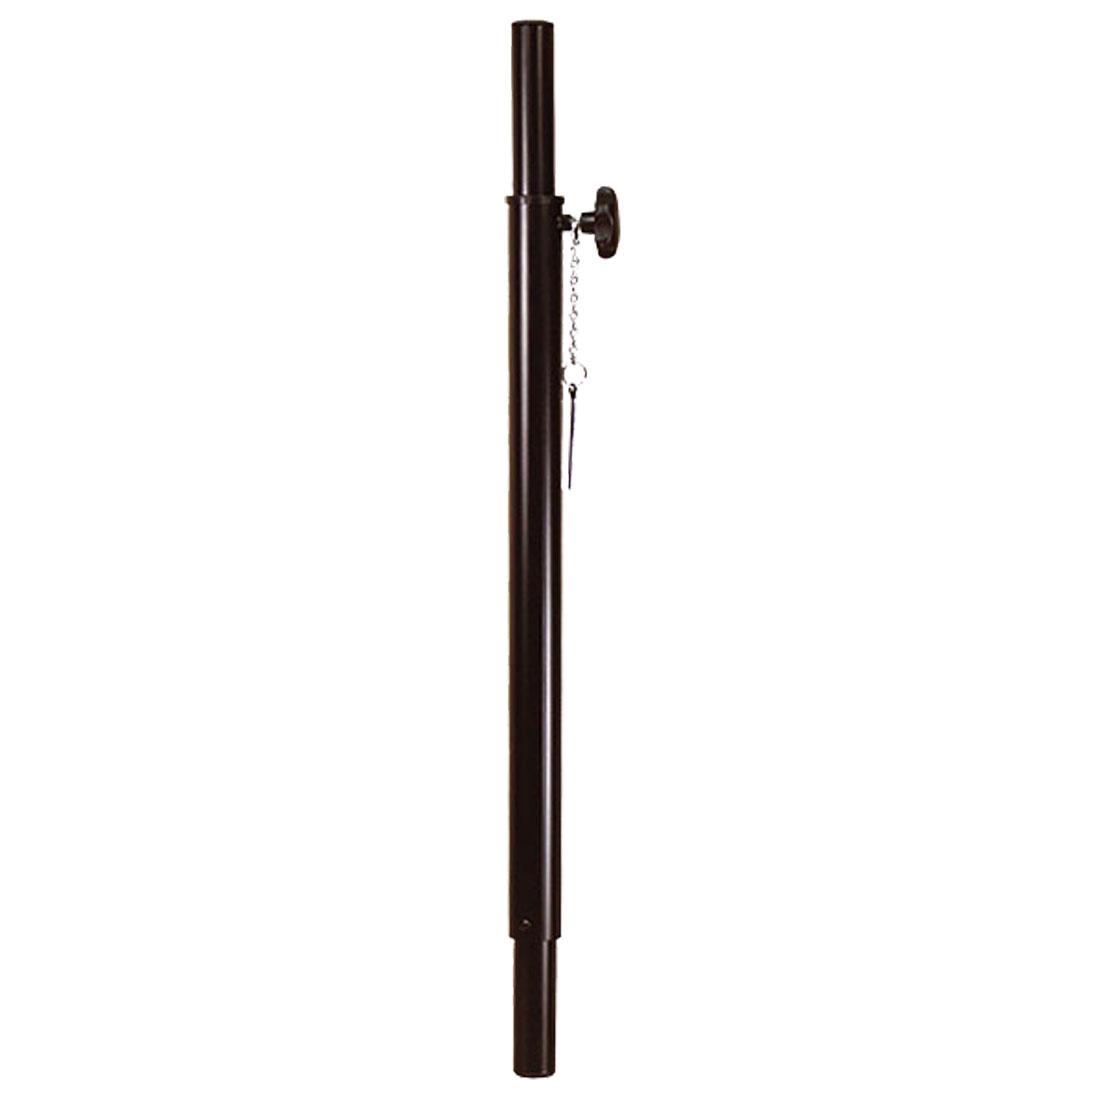 American Audio SAT-1 distance rod 35mm, steel, 40kg max